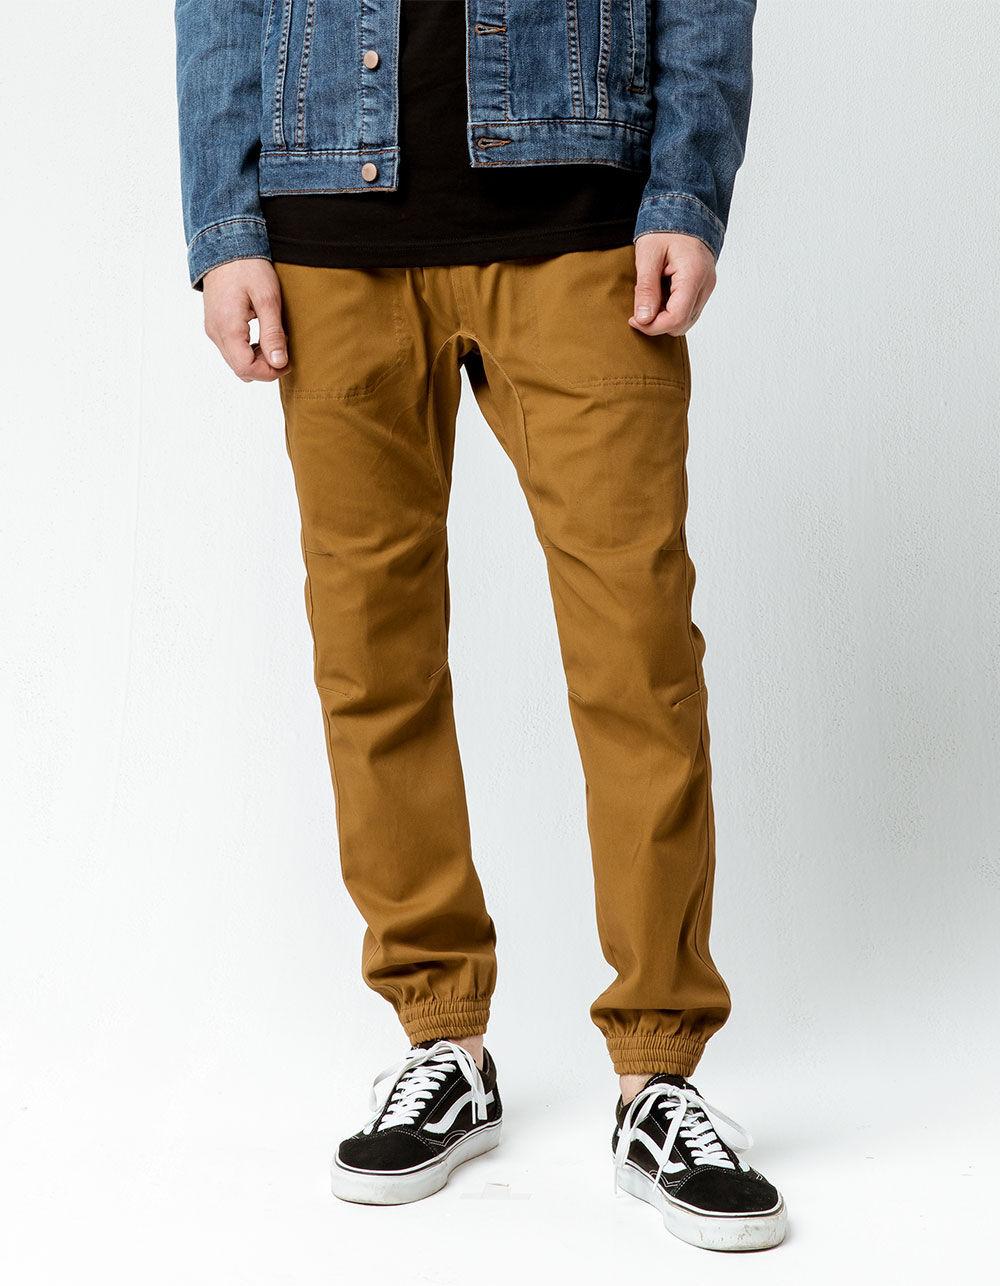 Image of BROOKLYN CLOTH TWILL PORK CHOP POCKET JOGGER PANTS